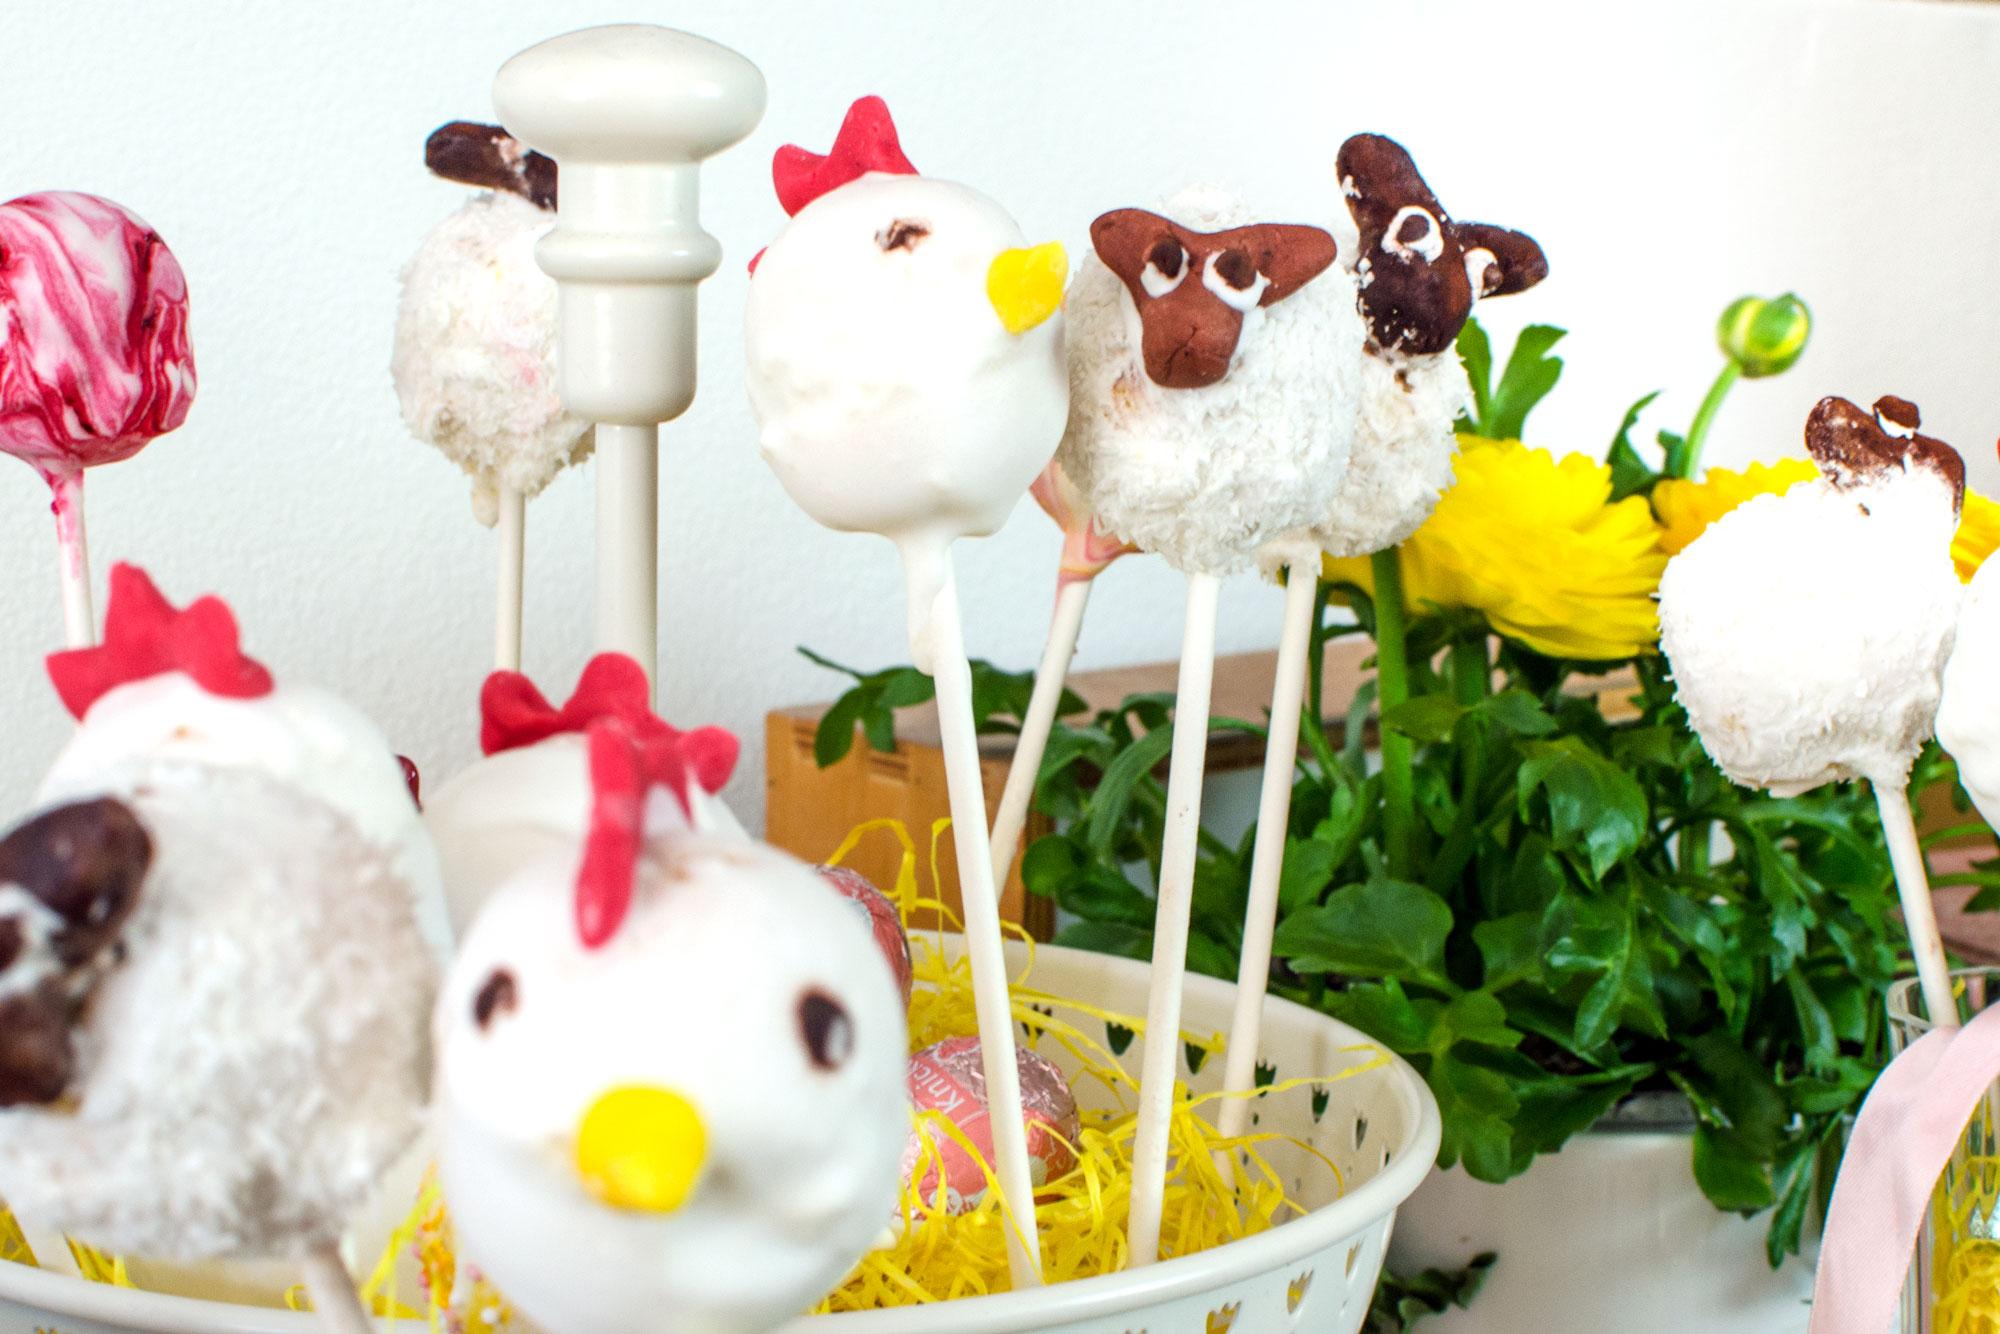 [unbezahlte werbung]Cake Pops - so cute, ob zu Ostern, Geburtstag, Party oder Mitbringsel